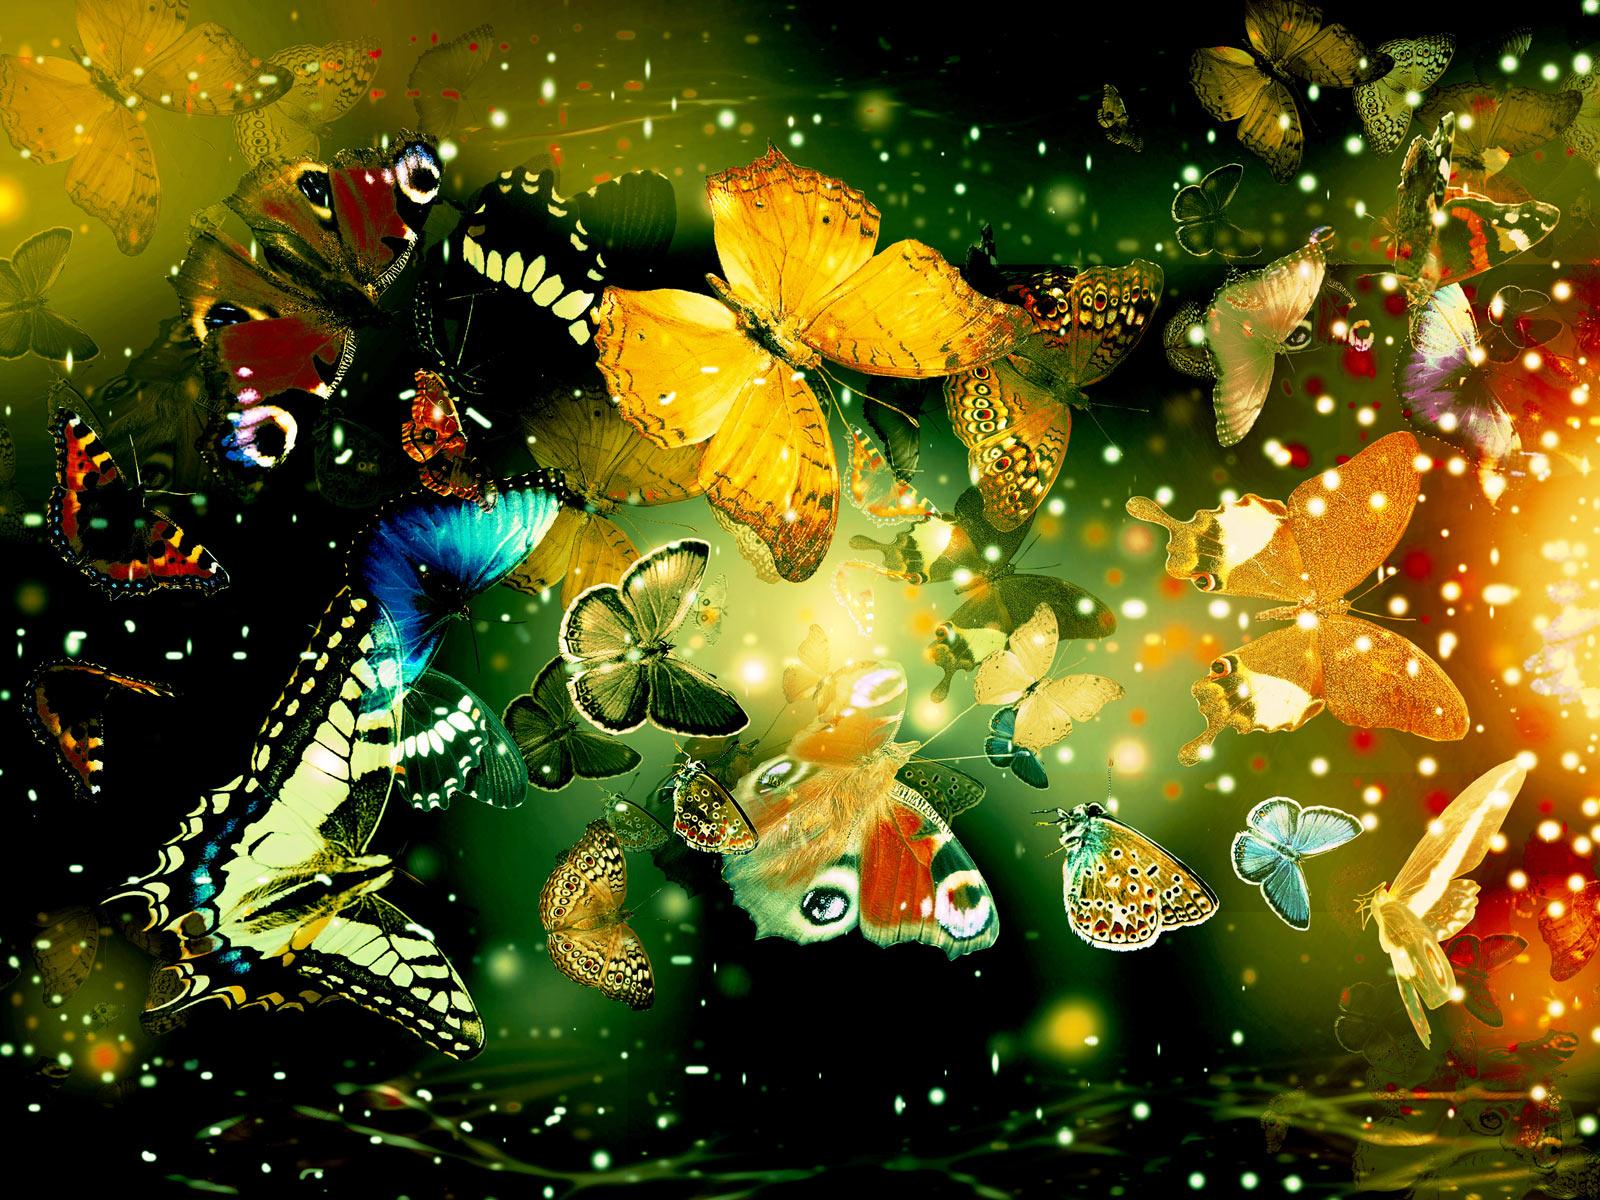 Wallpaper for My Desktop New London Wallpaper 1600x1200